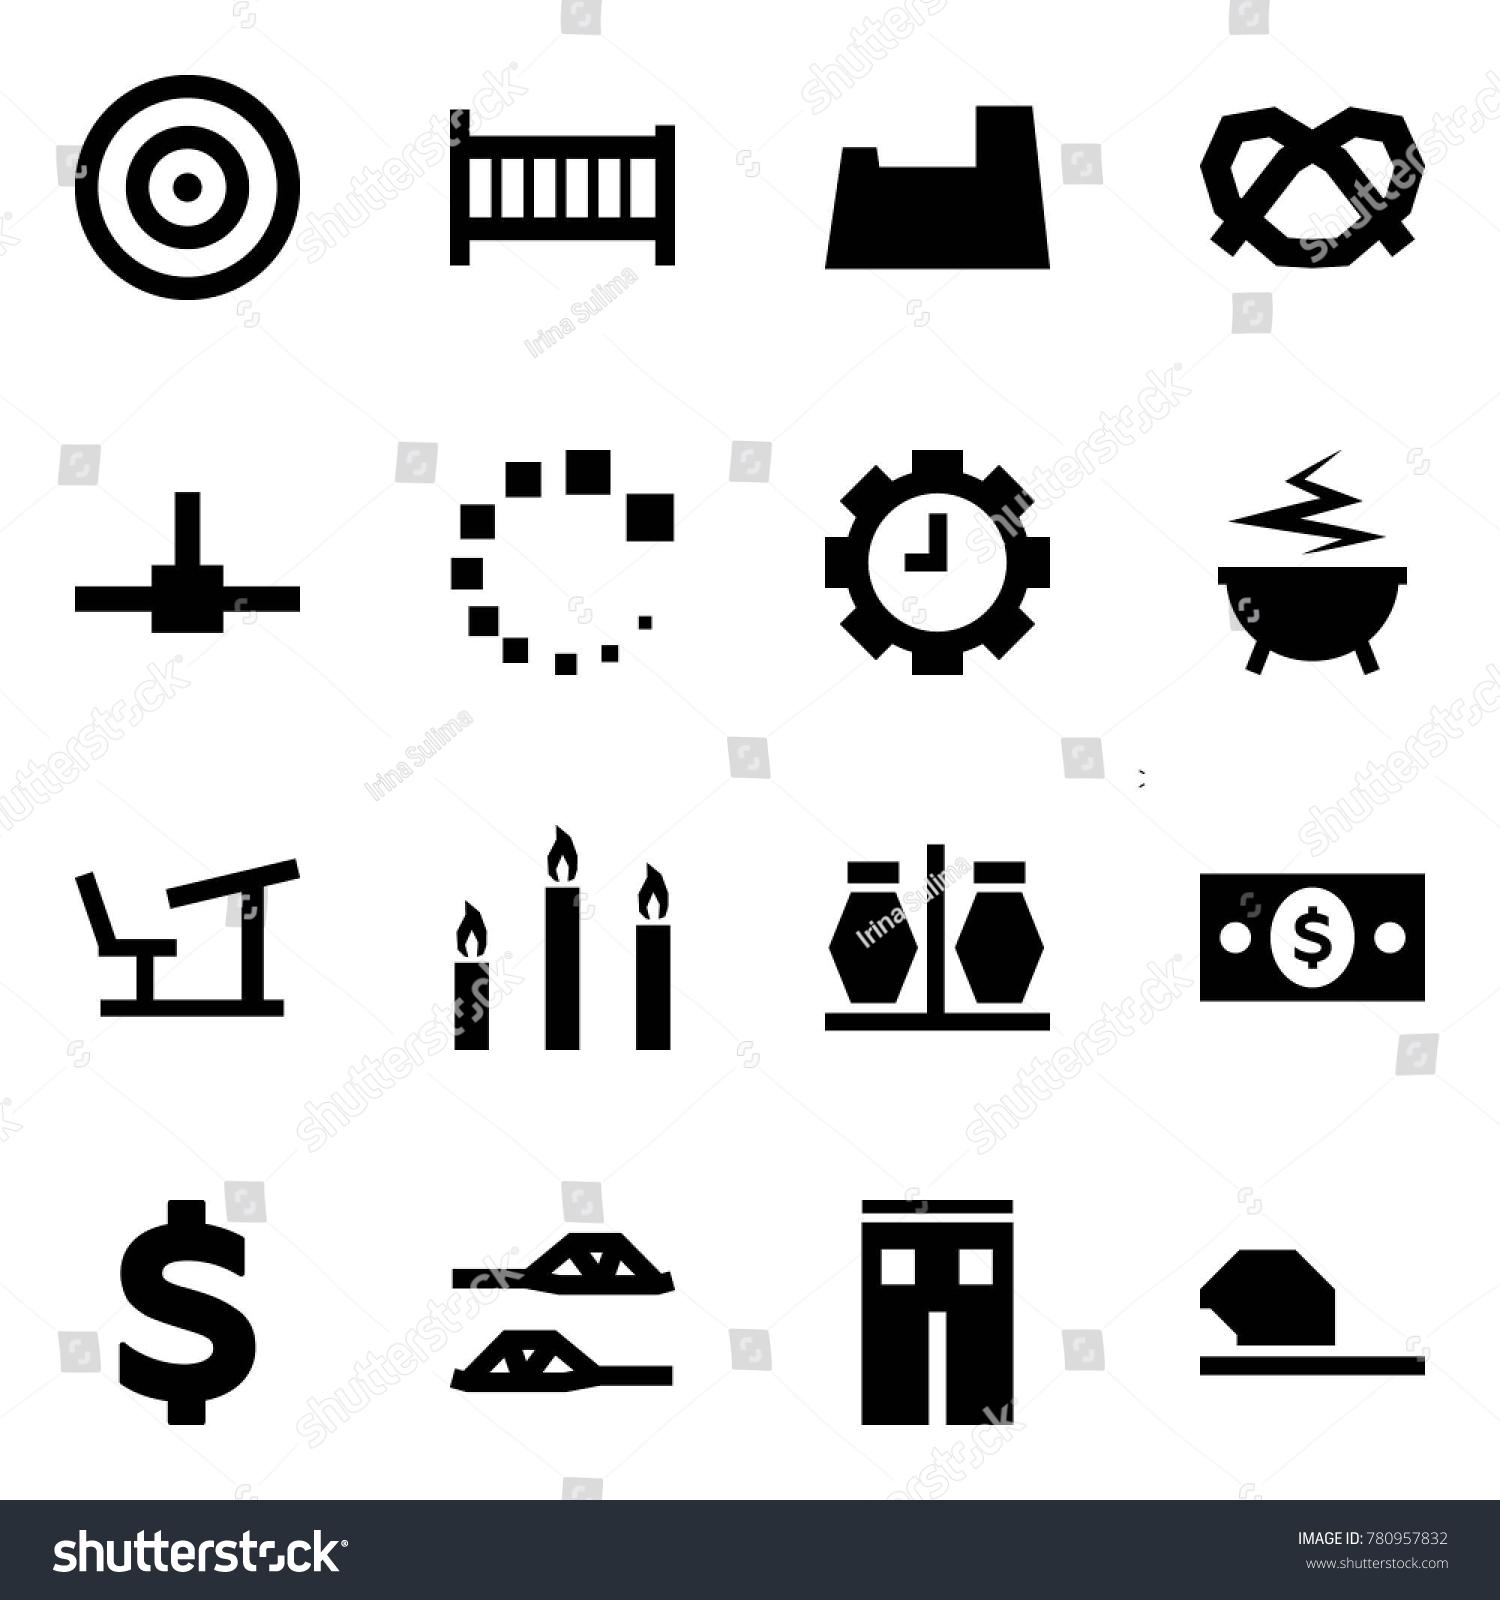 d03e55c1 Origami style icon set - target vector, crib, potty, pretzel, connect,